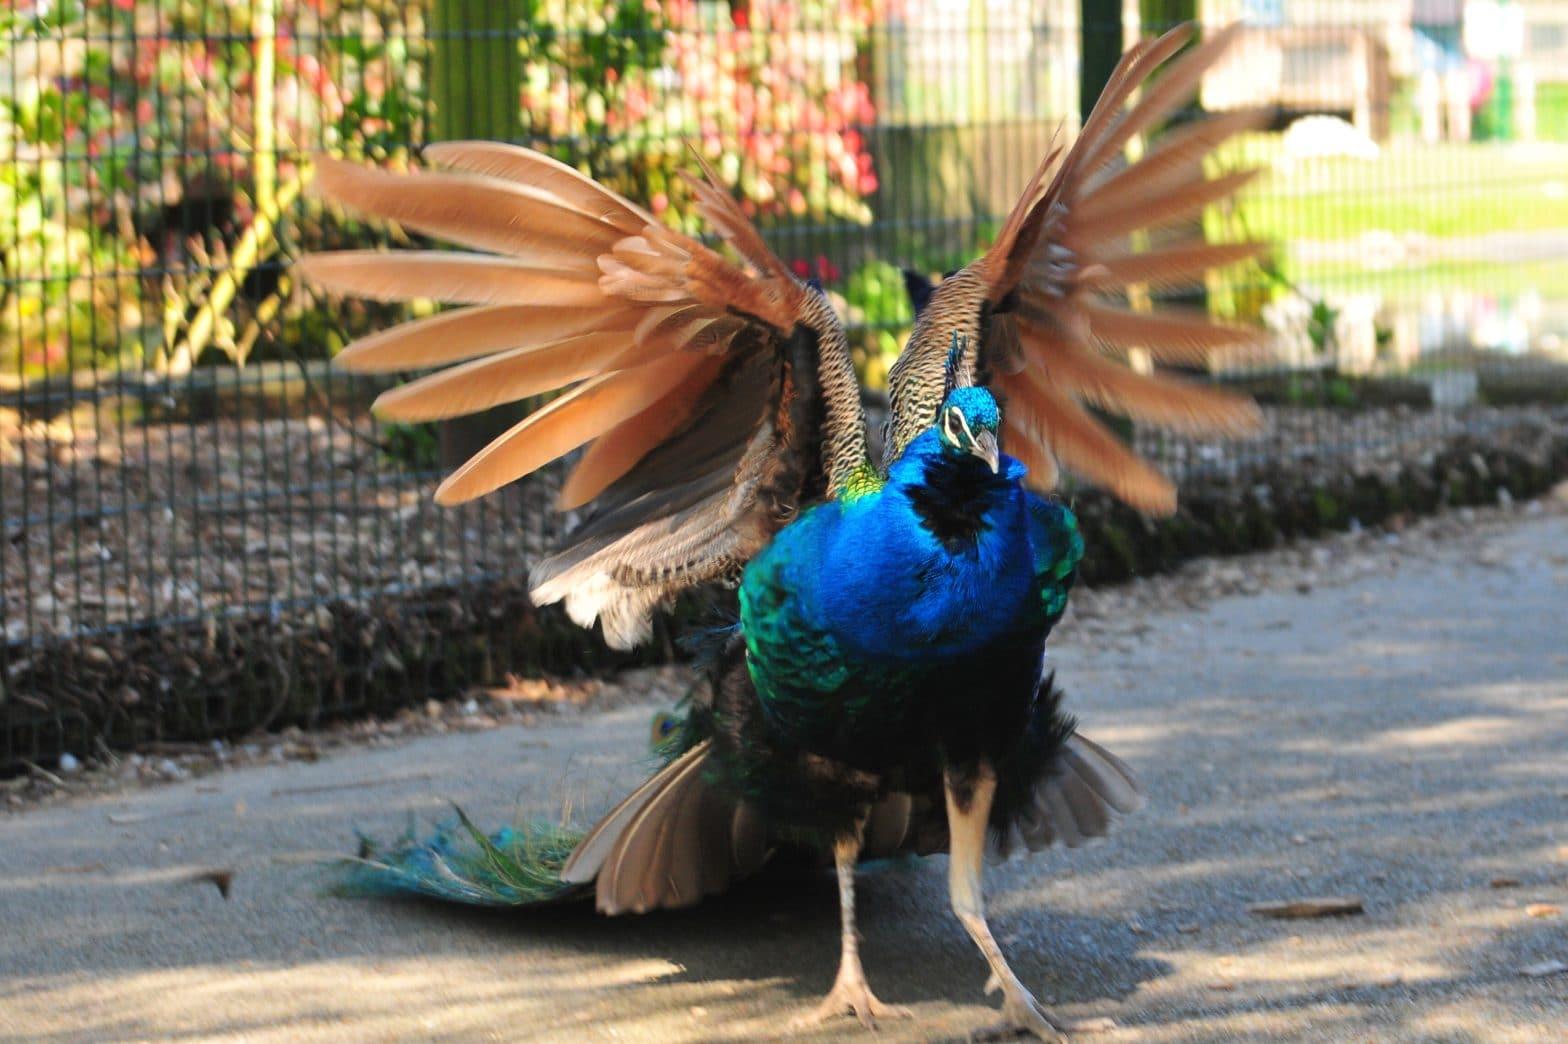 Peacock at Walton Hall and Gardens